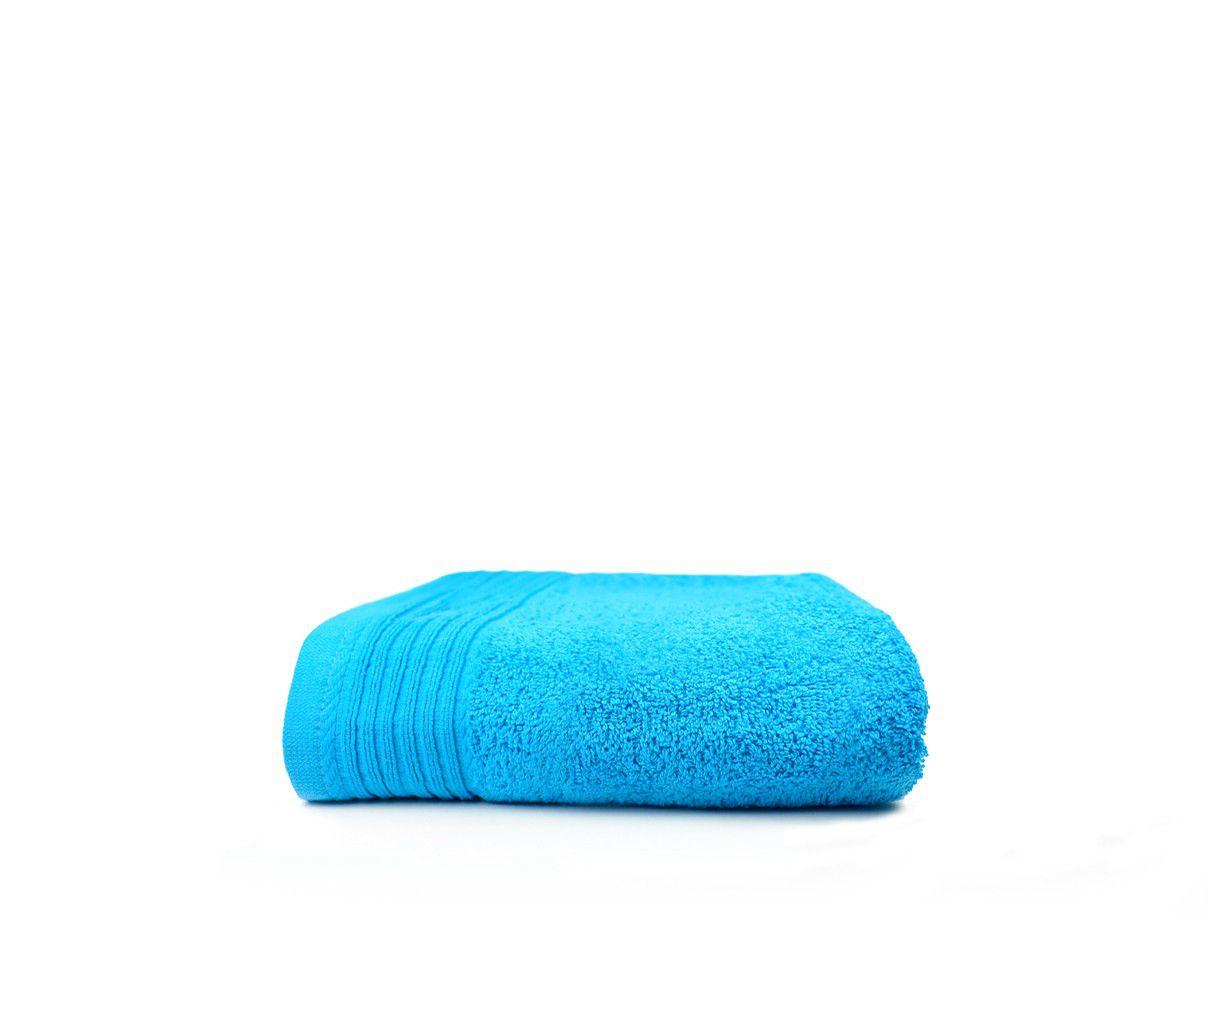 The One Handdoek 450 gram 50x100 cm Turquoise